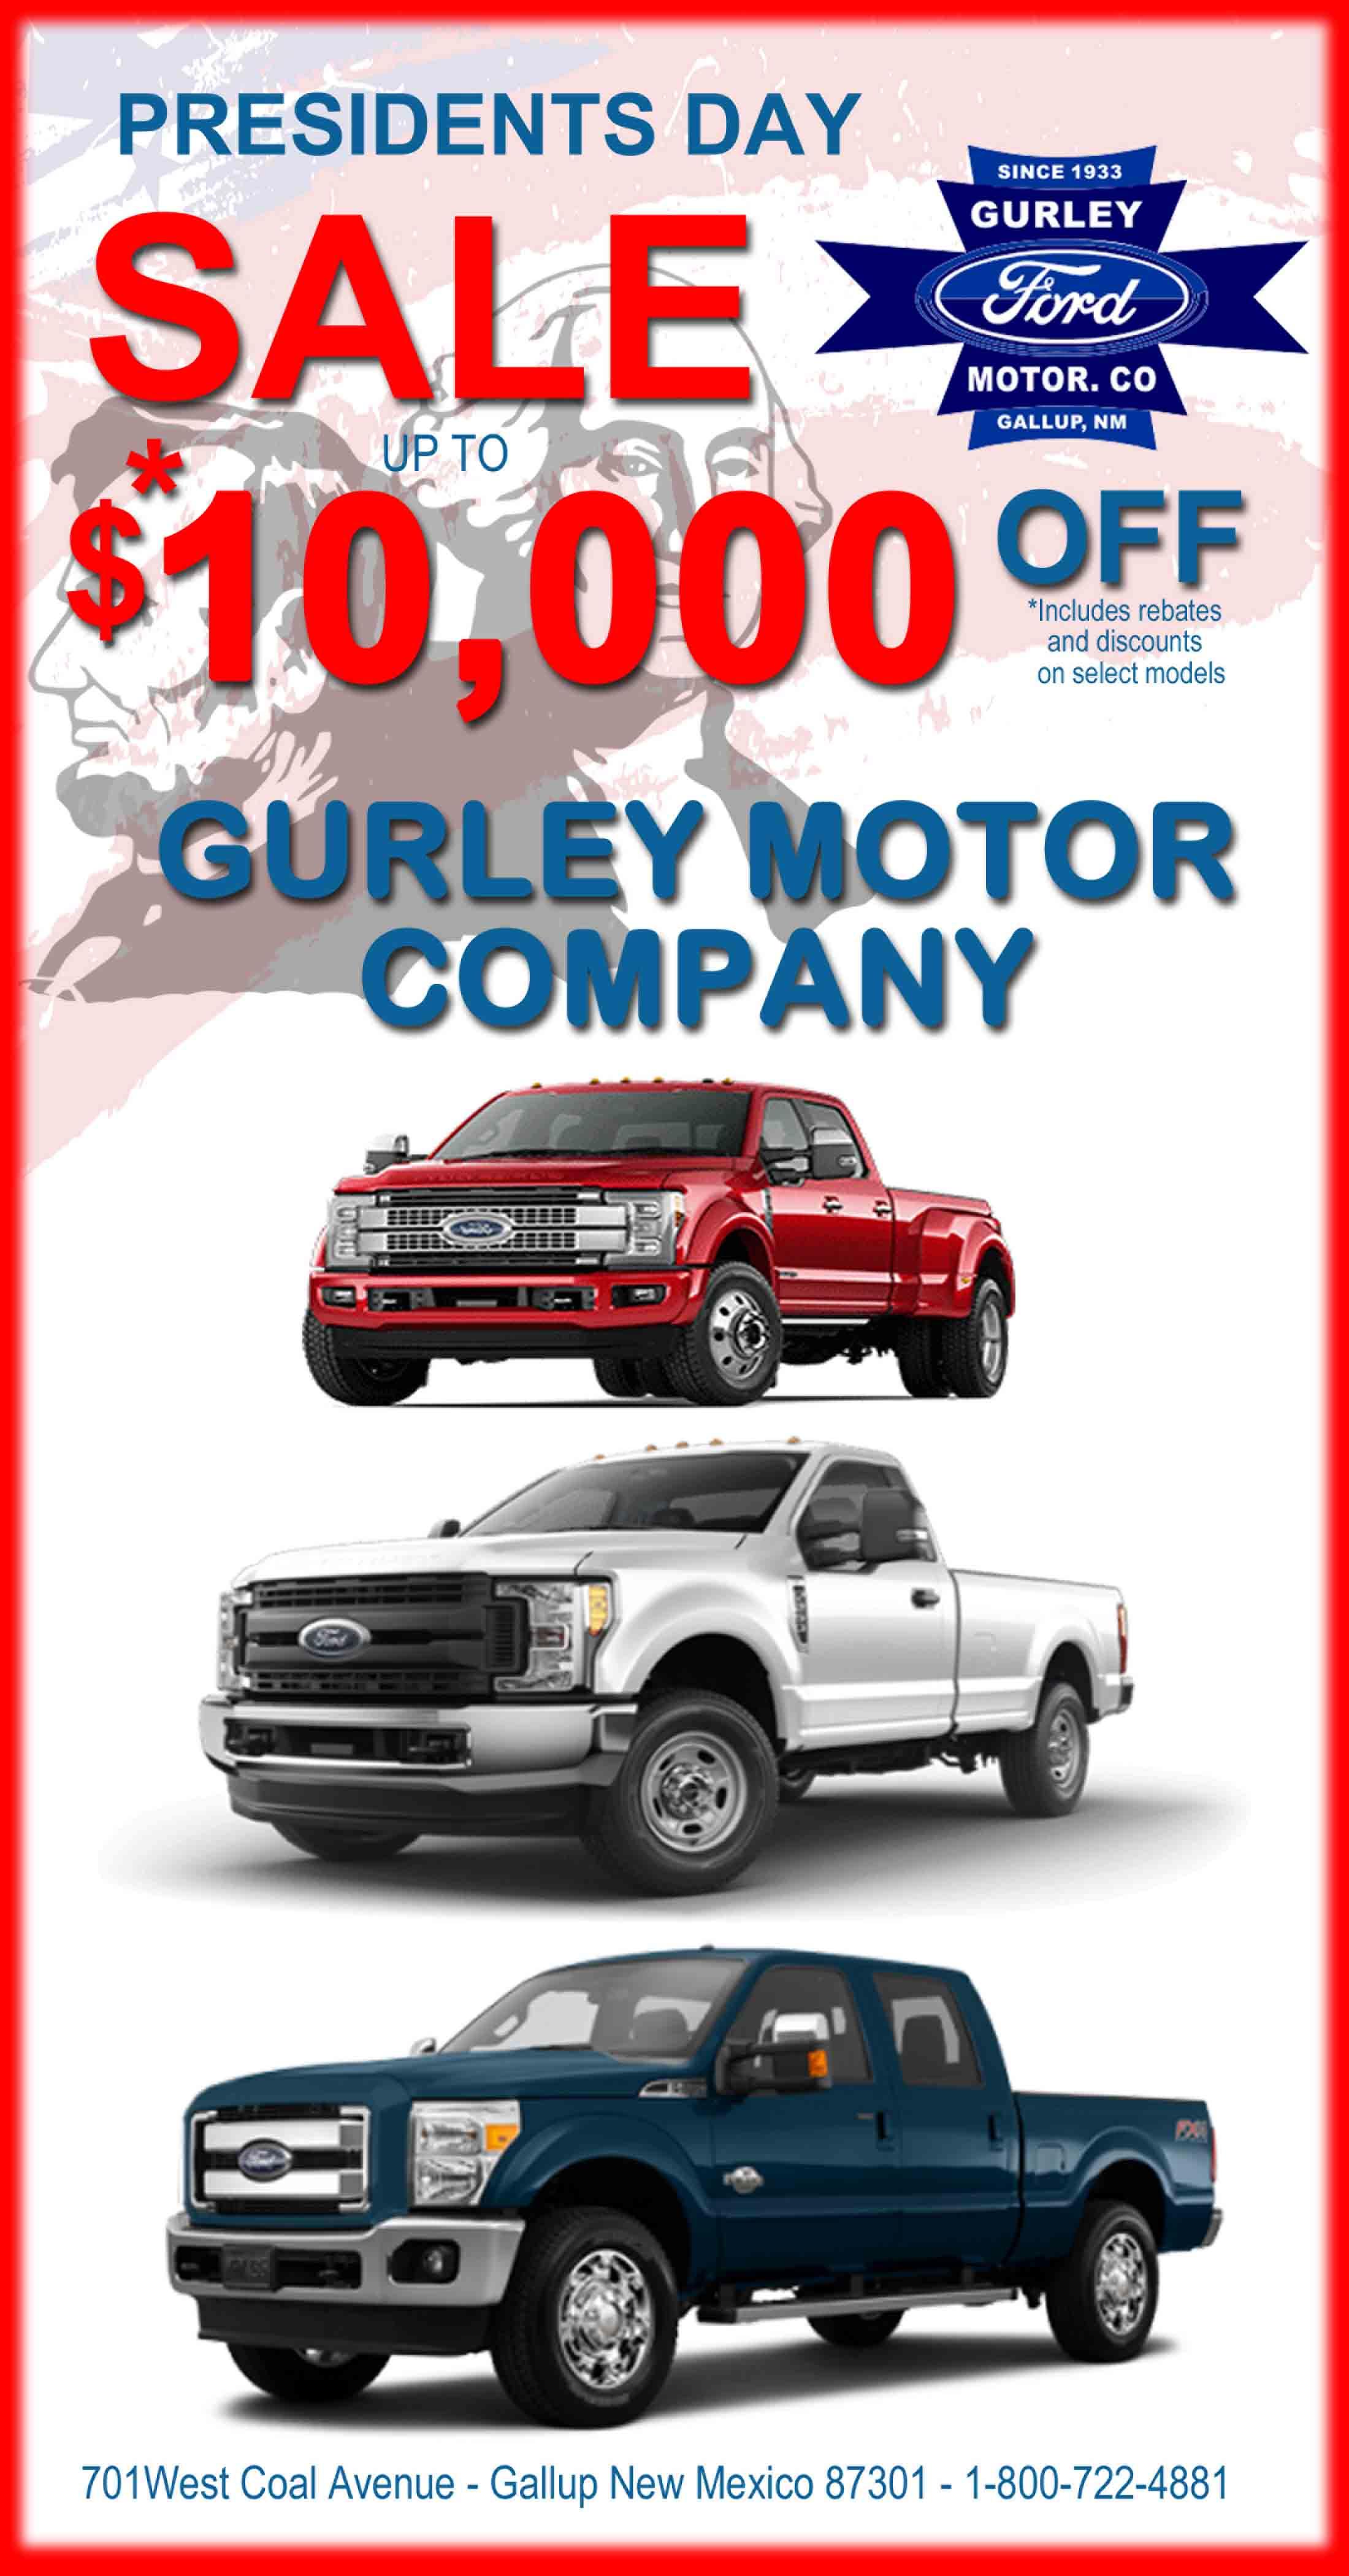 2017 gurley motor co president 39 s day sale Gurley motor